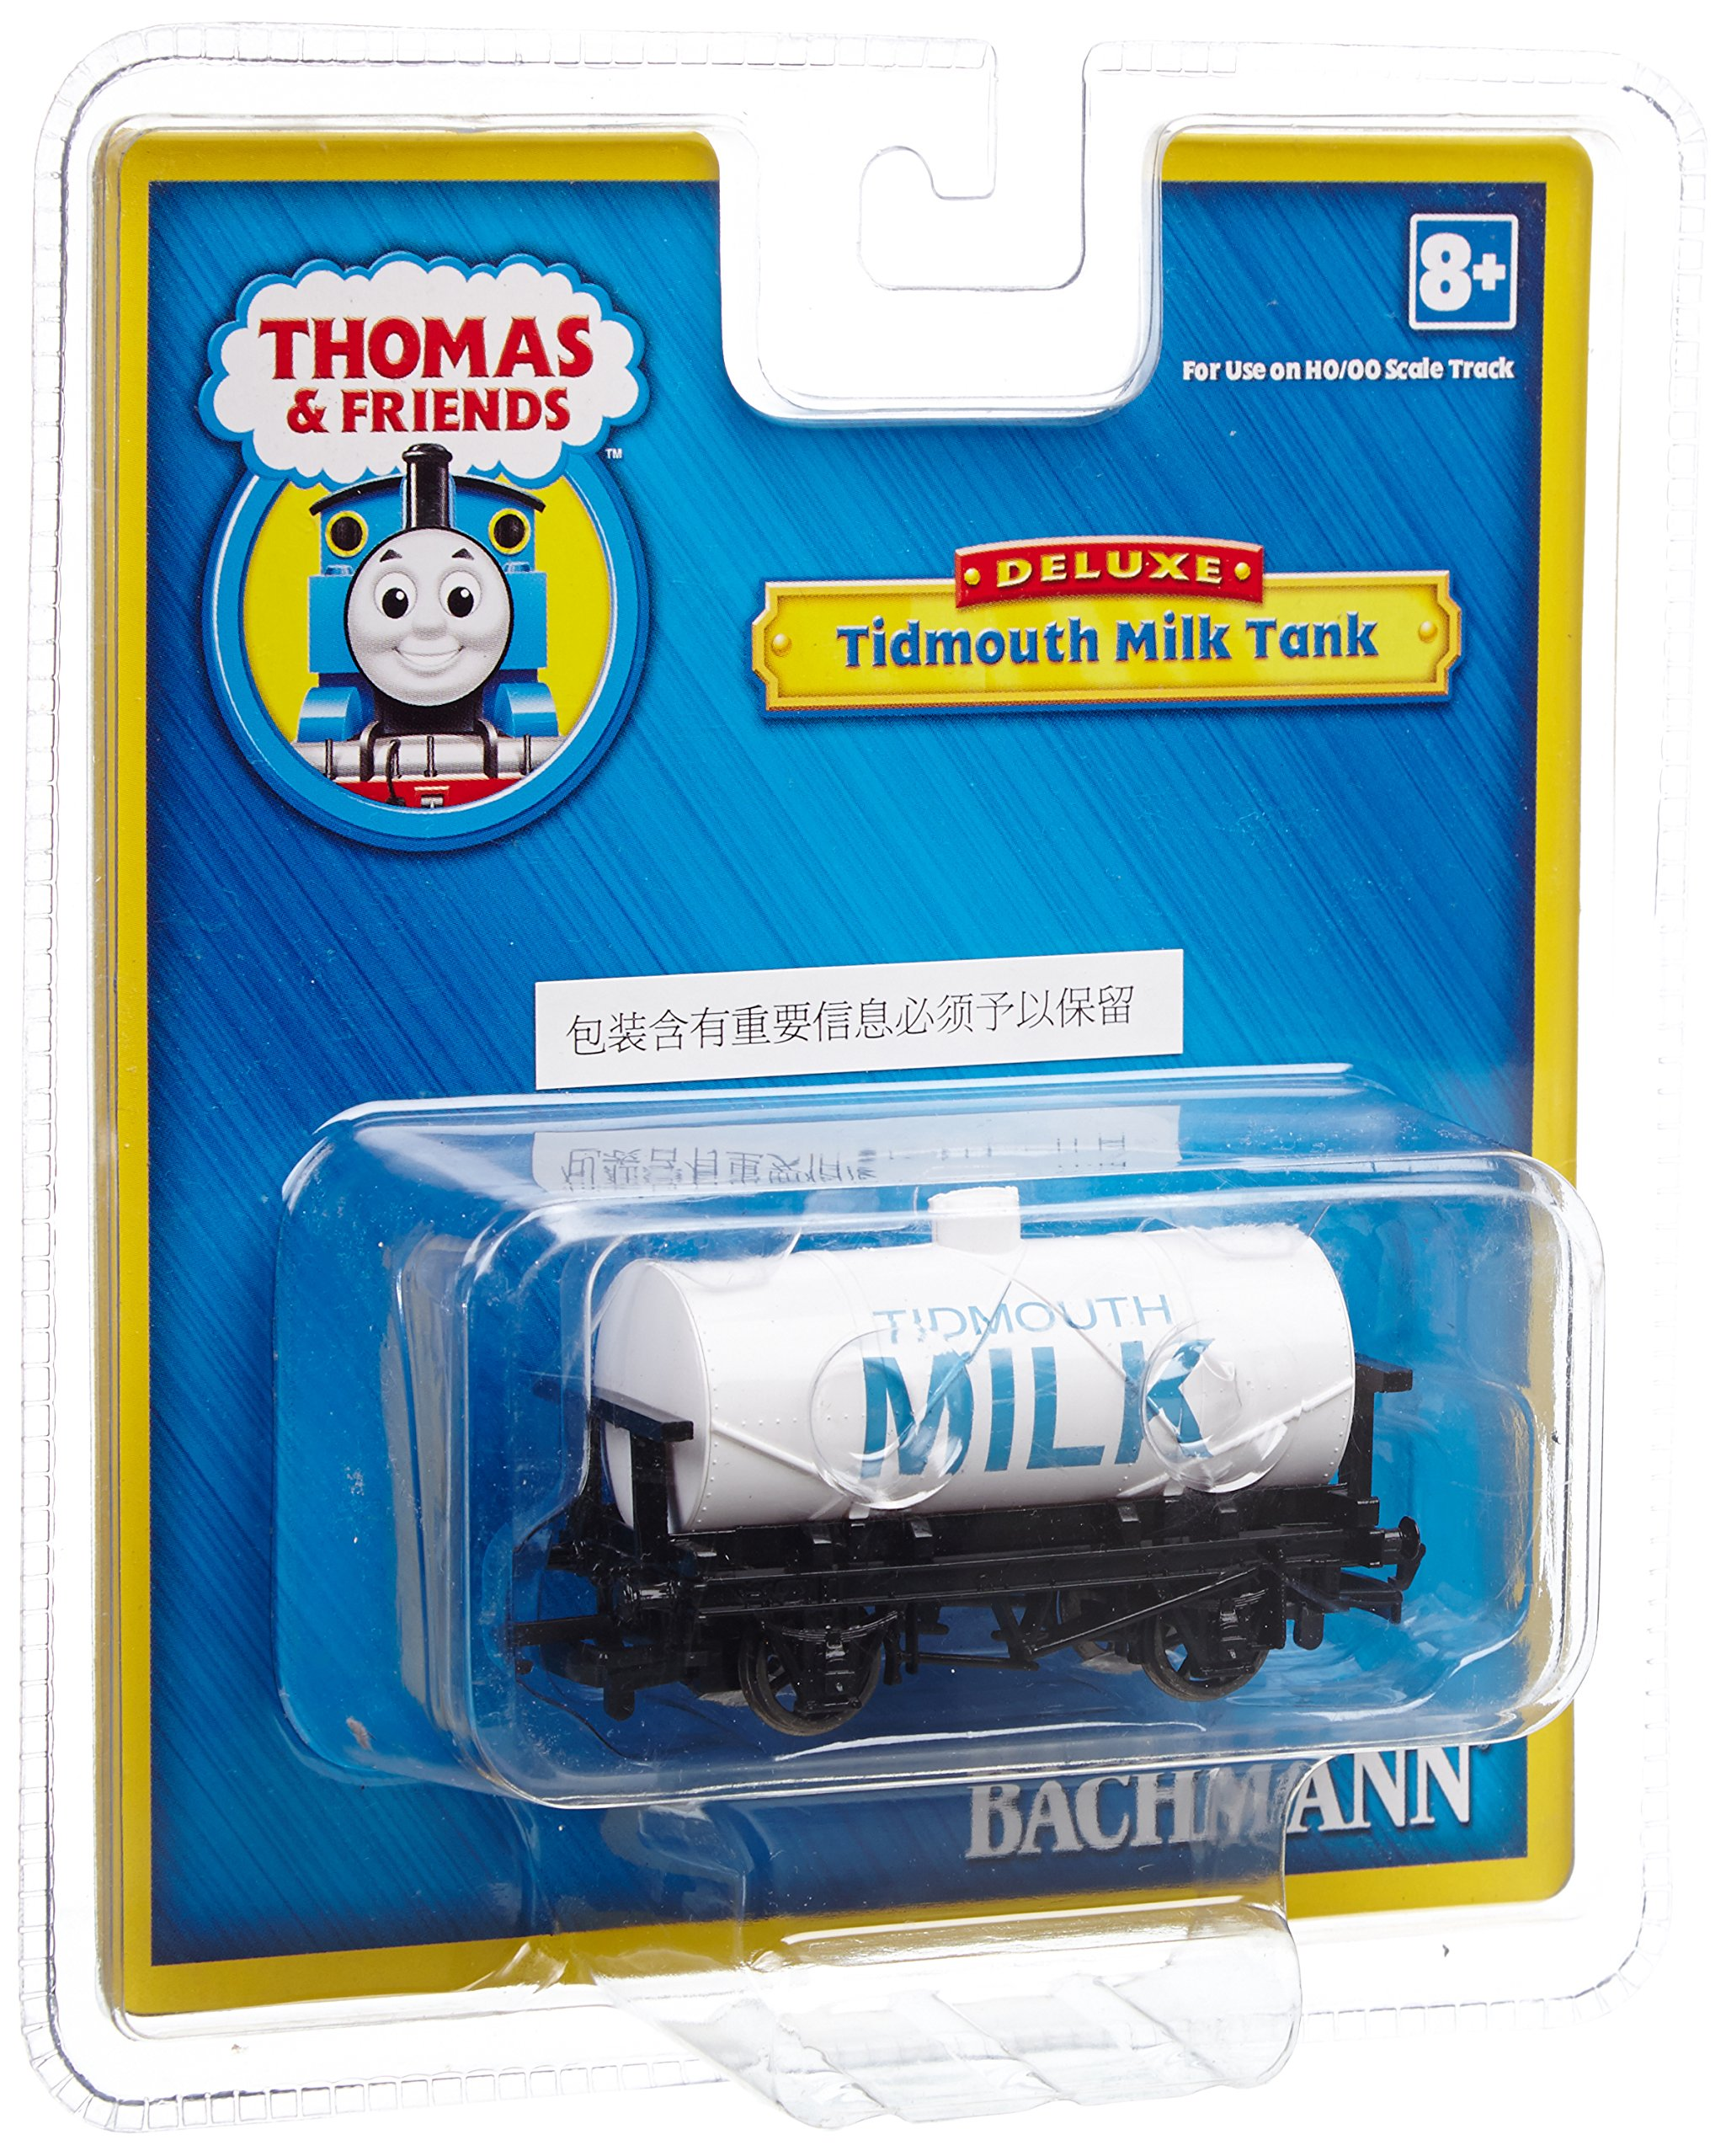 Bachmann Trains Thomas And Friends - Tidmouth Milk Tank